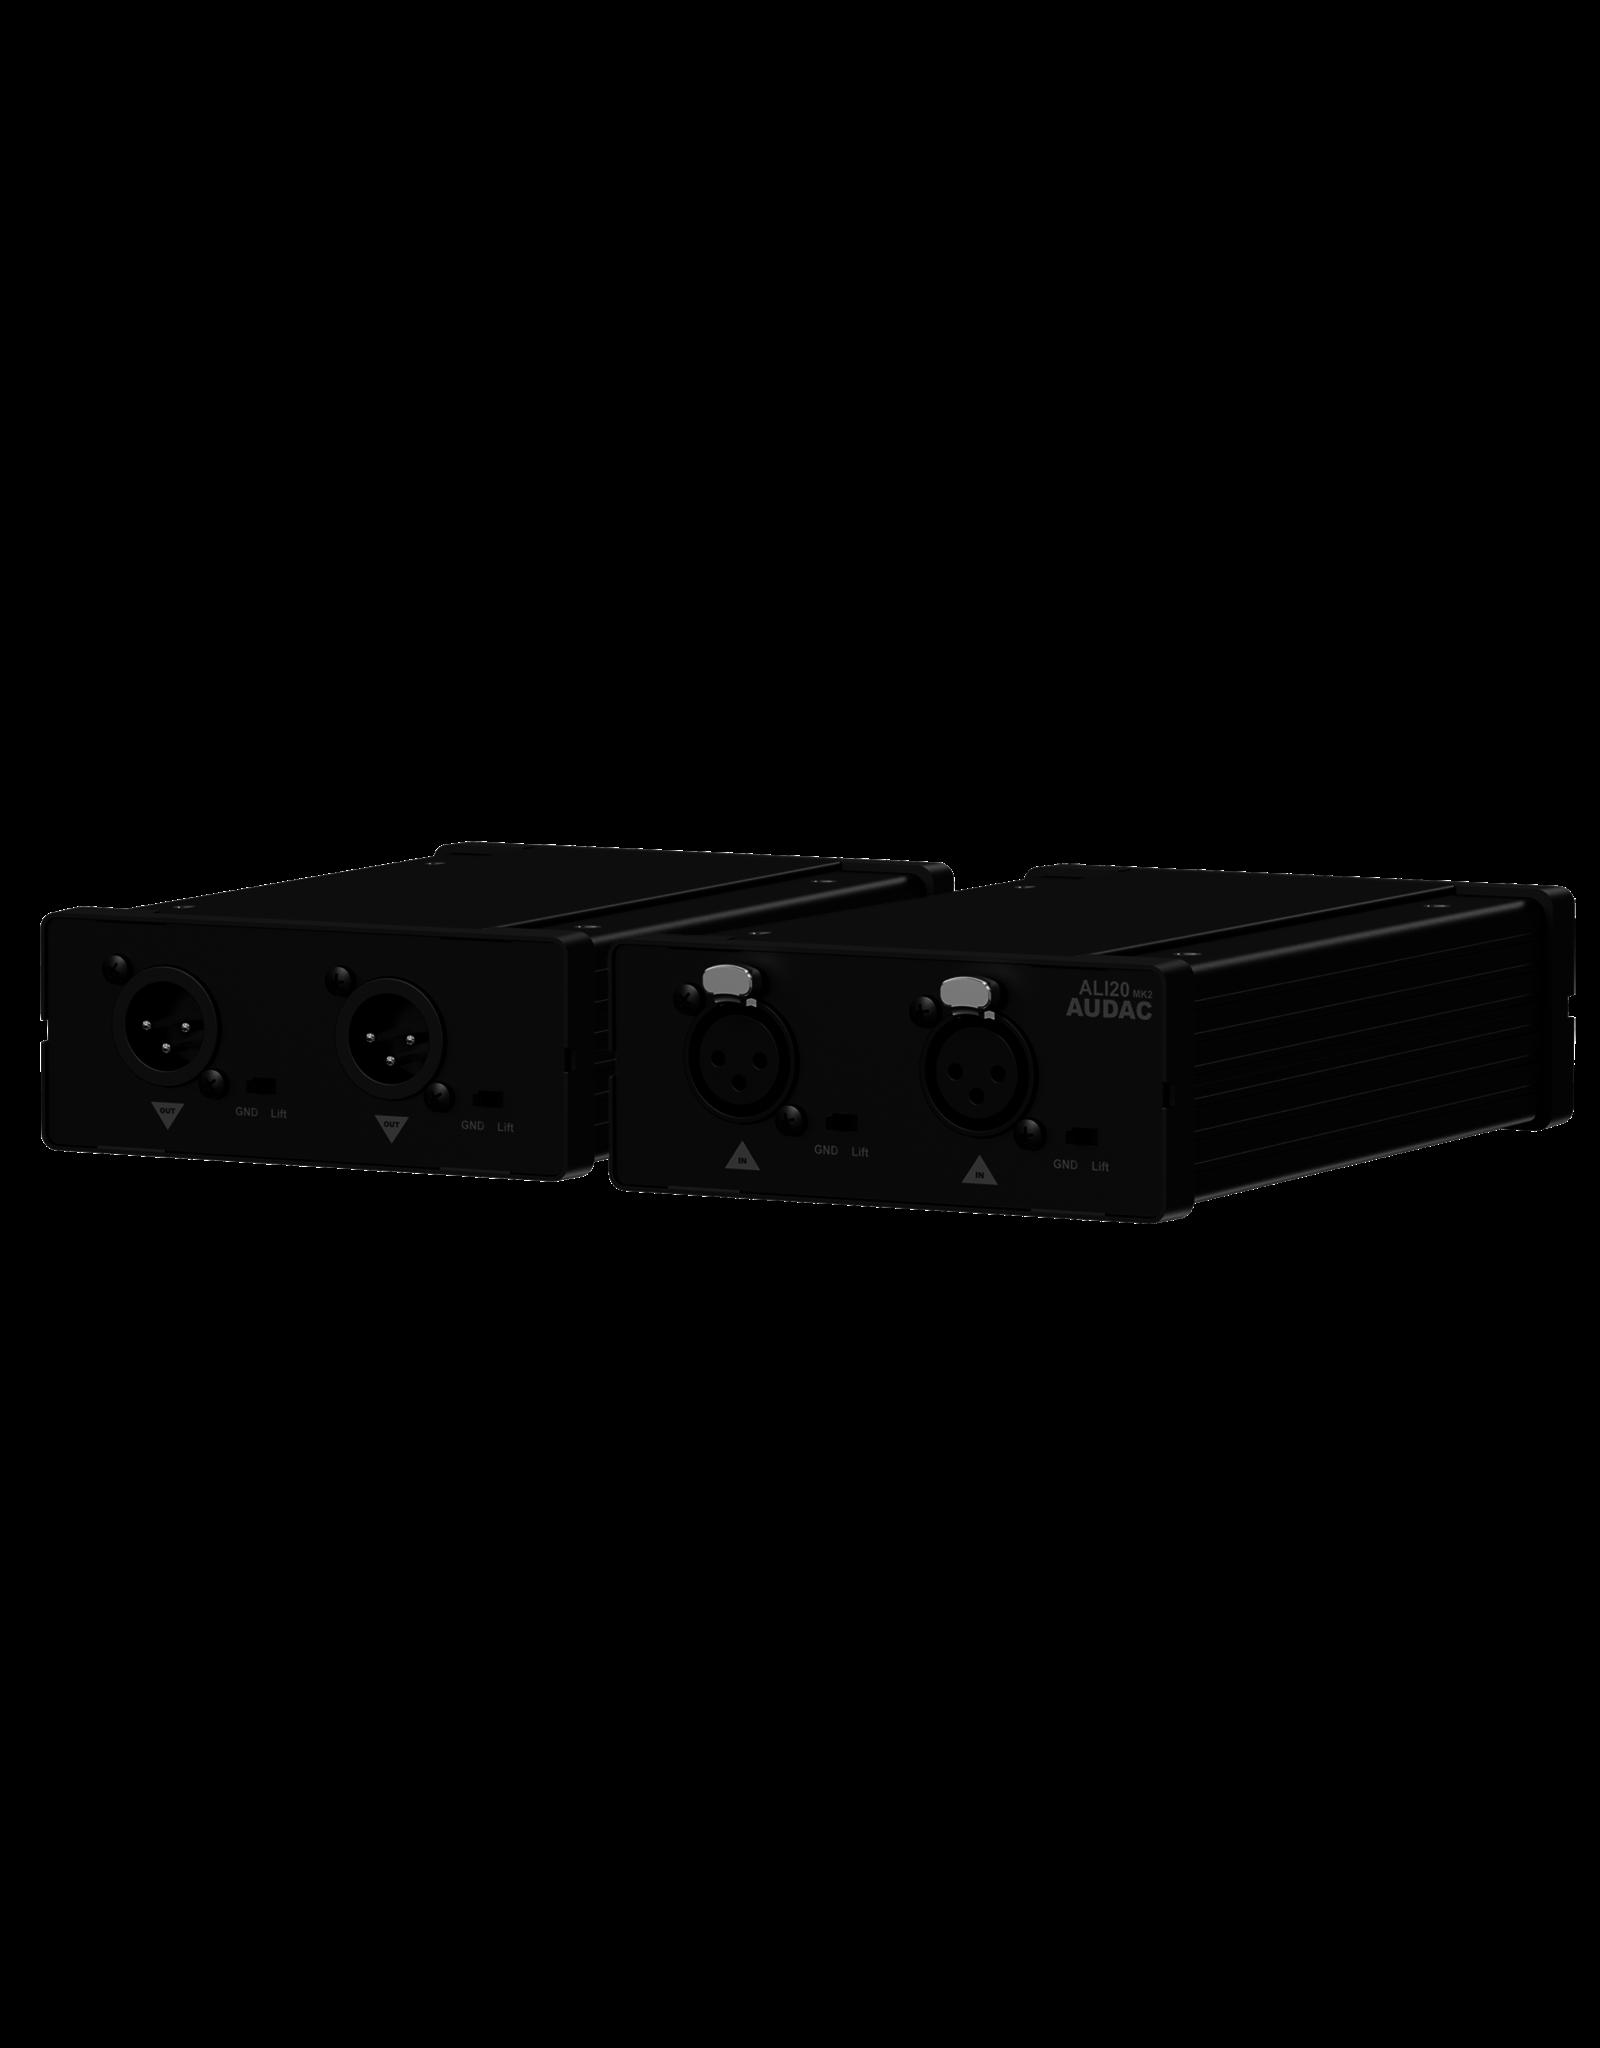 Audac Audio line isolator Shielded